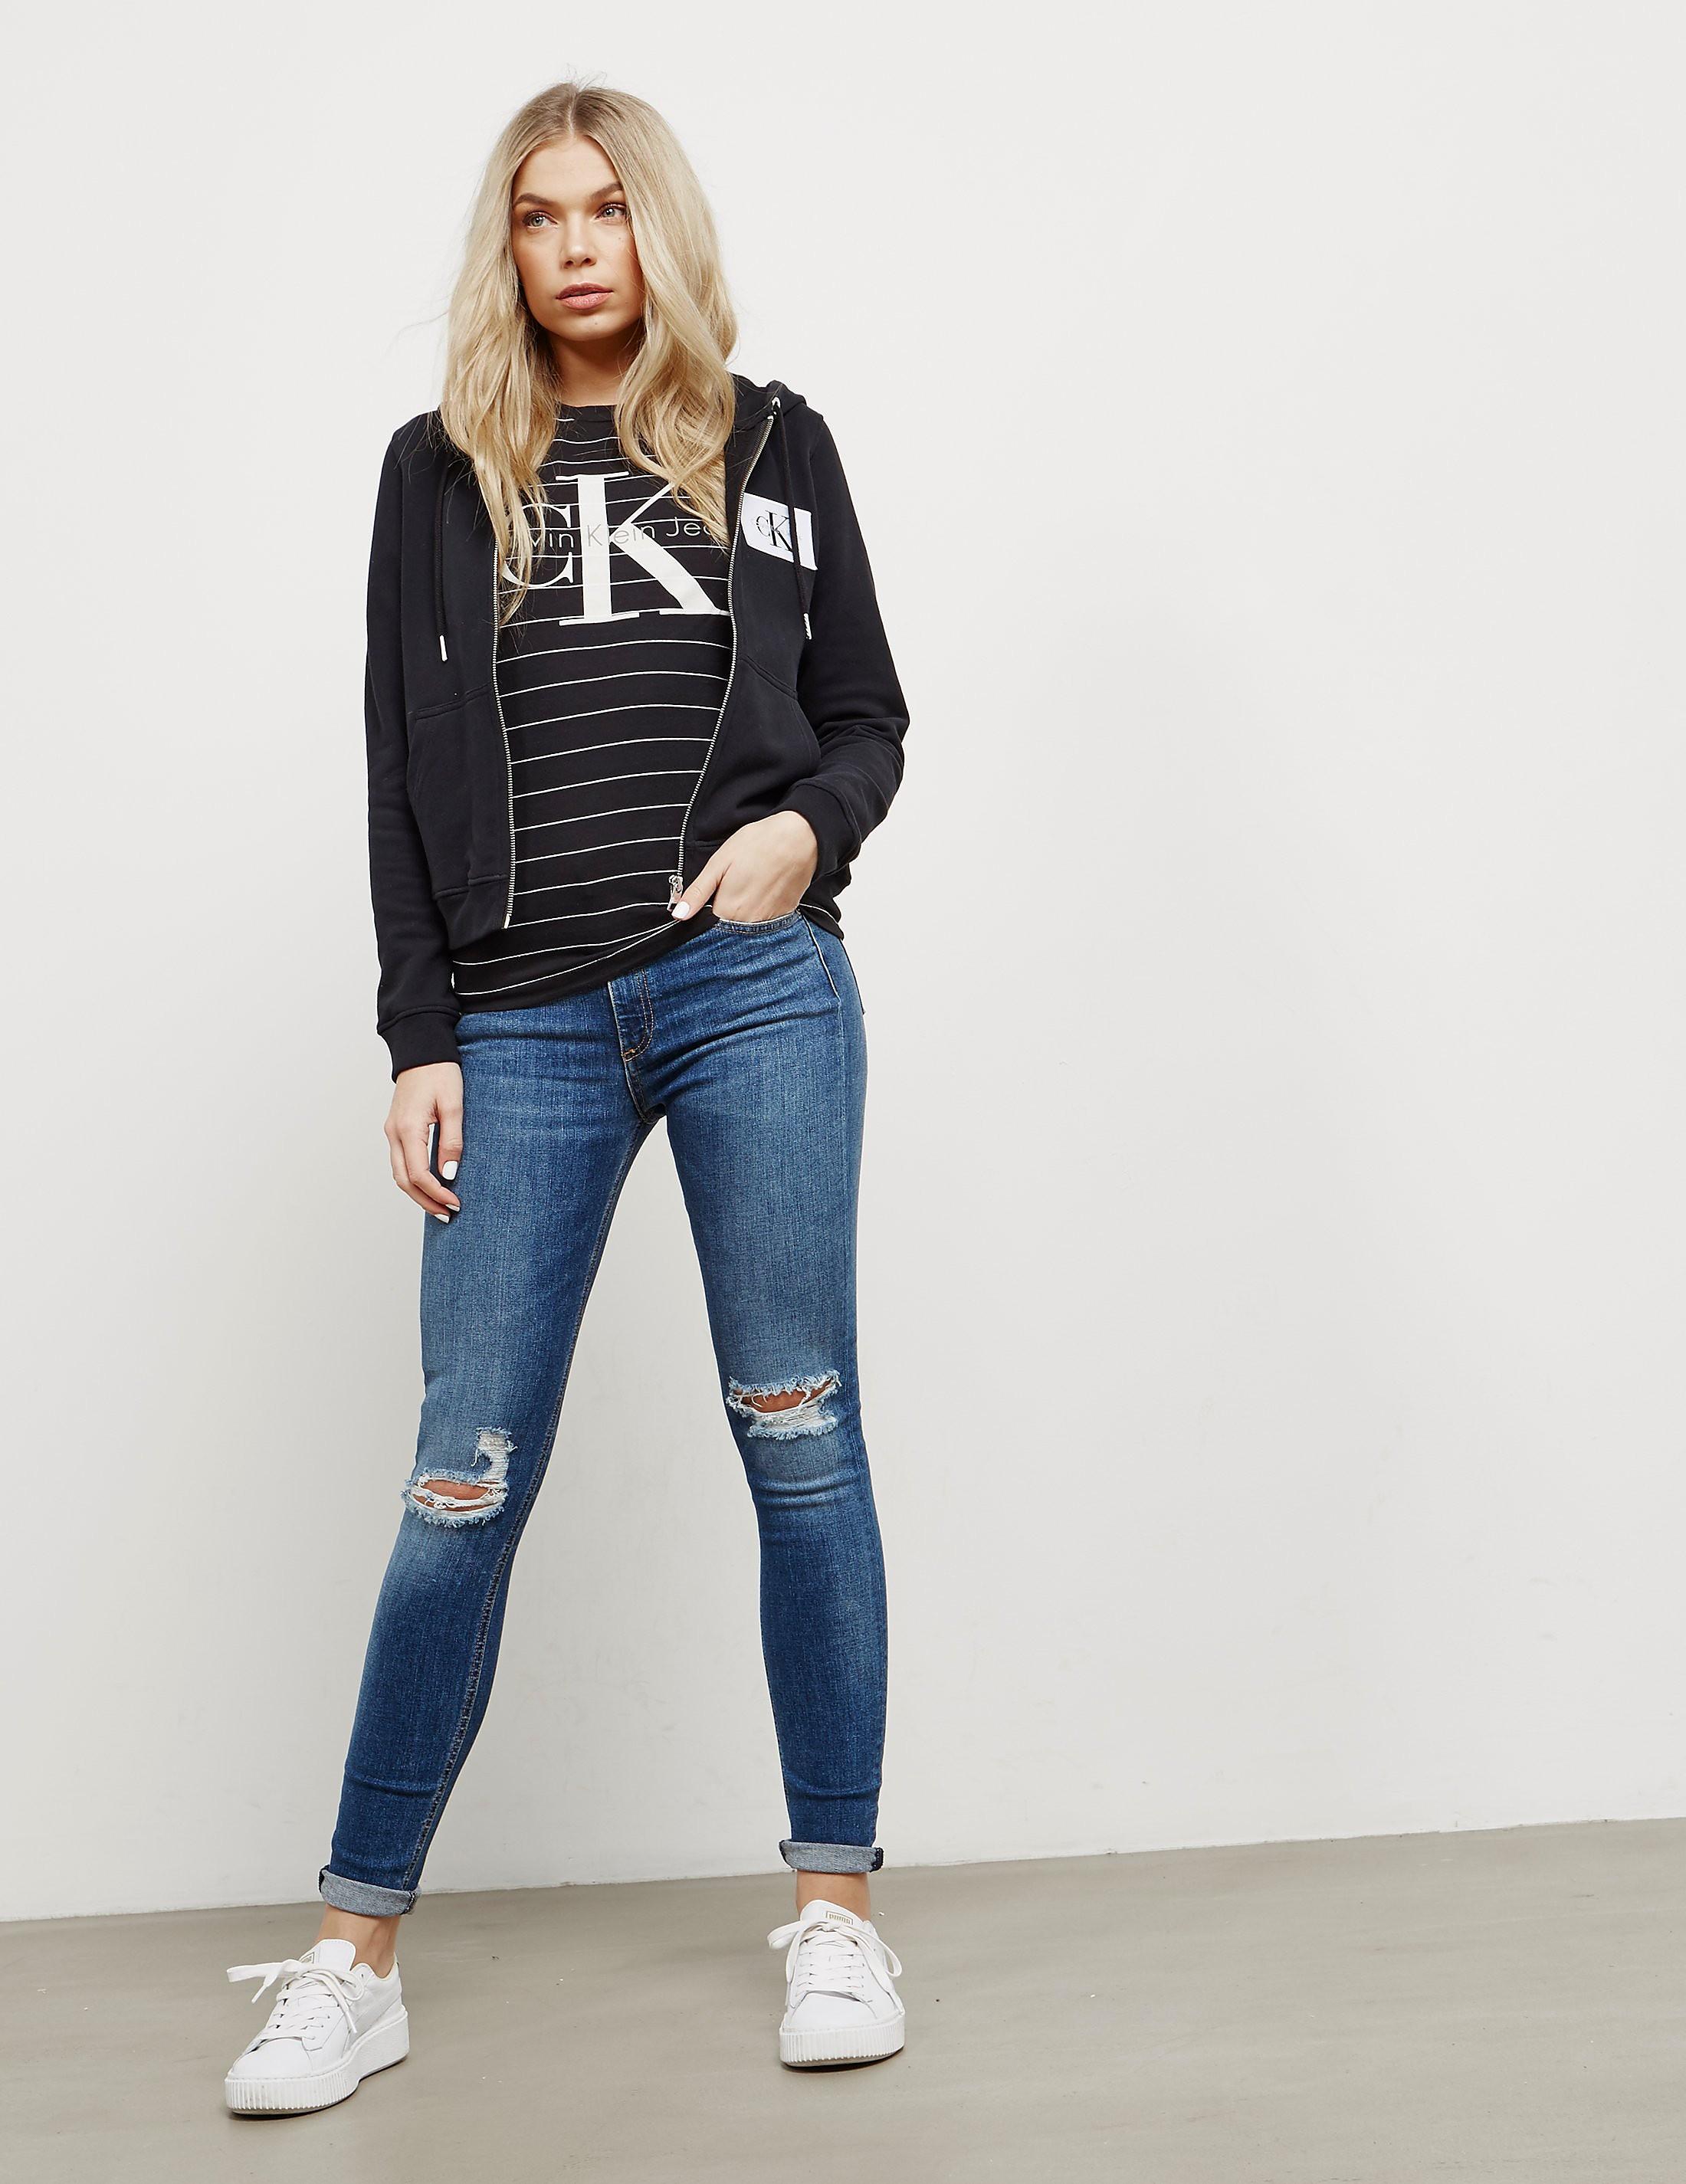 Calvin Klein True Icon Full Zip Hoody